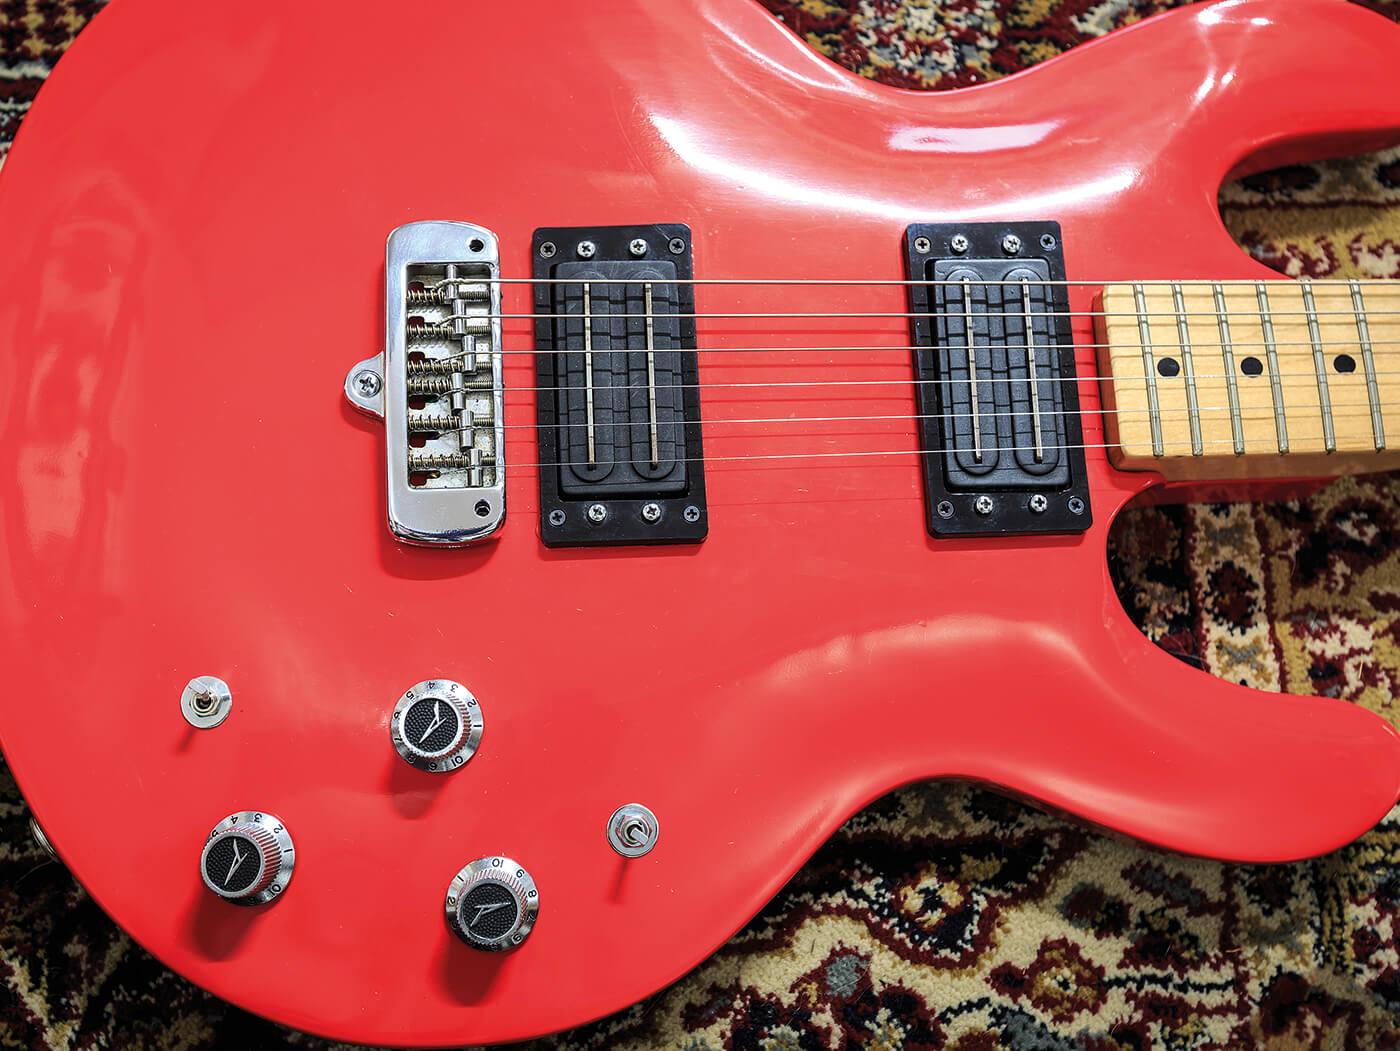 Collections Elite Vintage Guitars 1979 Peavey T-25